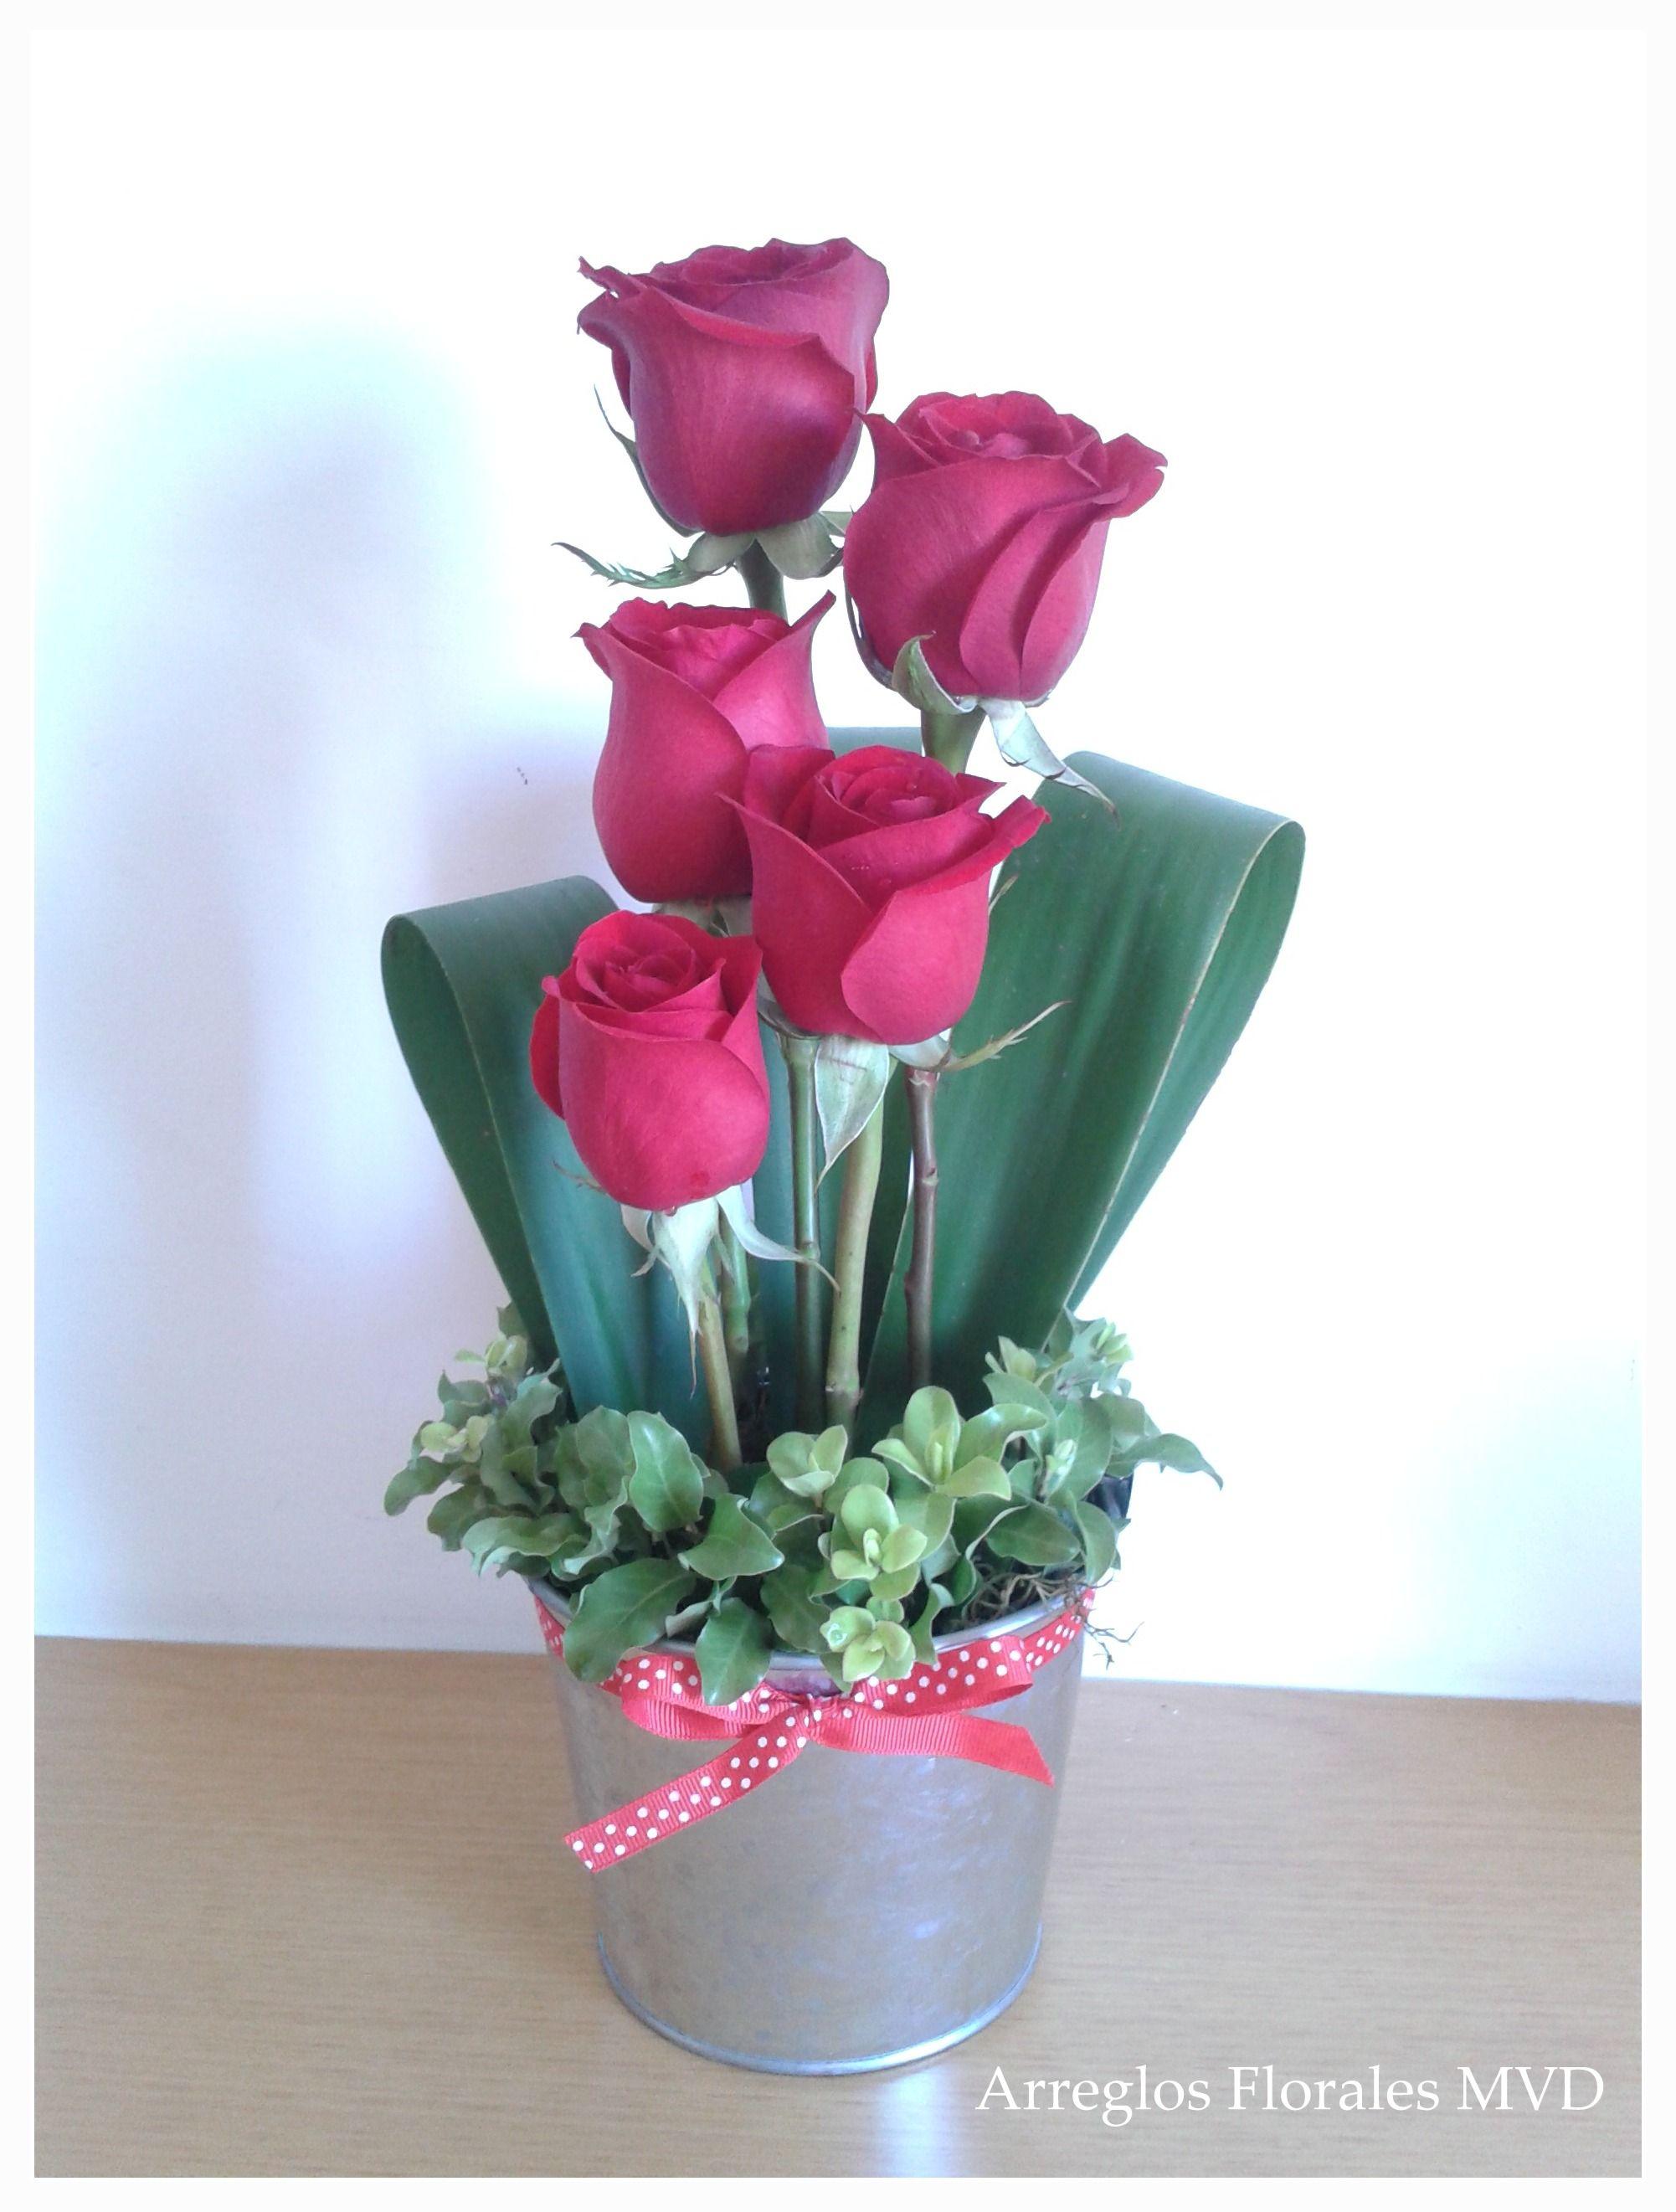 Rosas Minimalista Wwwarreglosfloralesmvdcom Arreglos